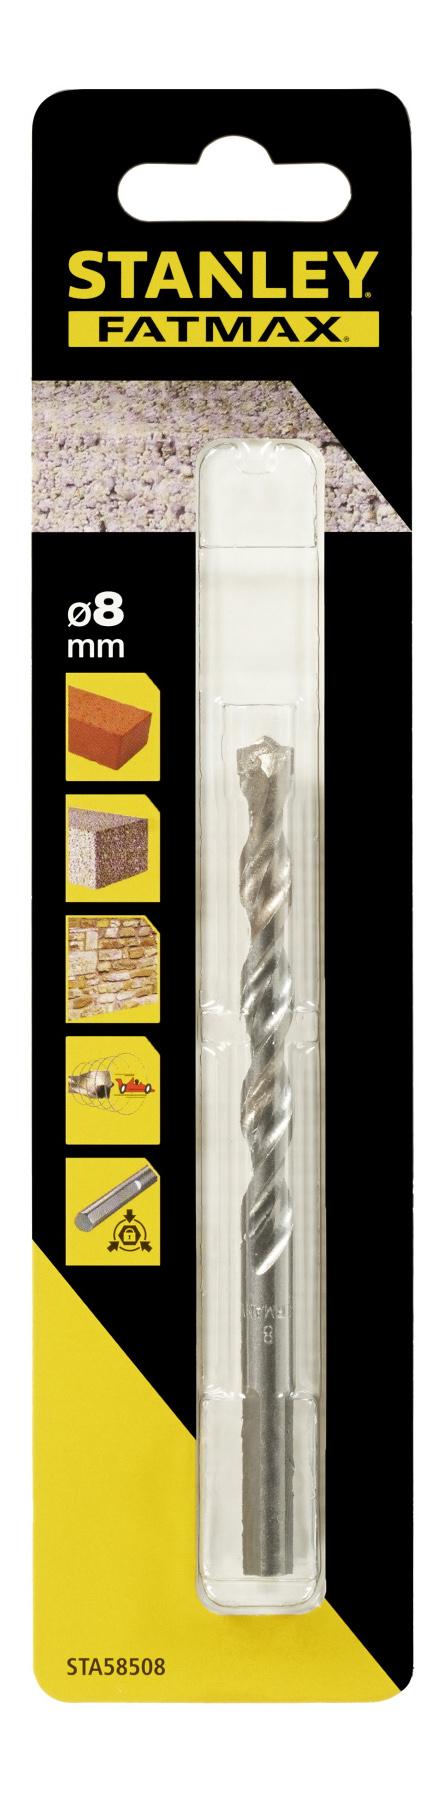 Сверло по бетону/камню для дрелей, шуруповертов STANLEY